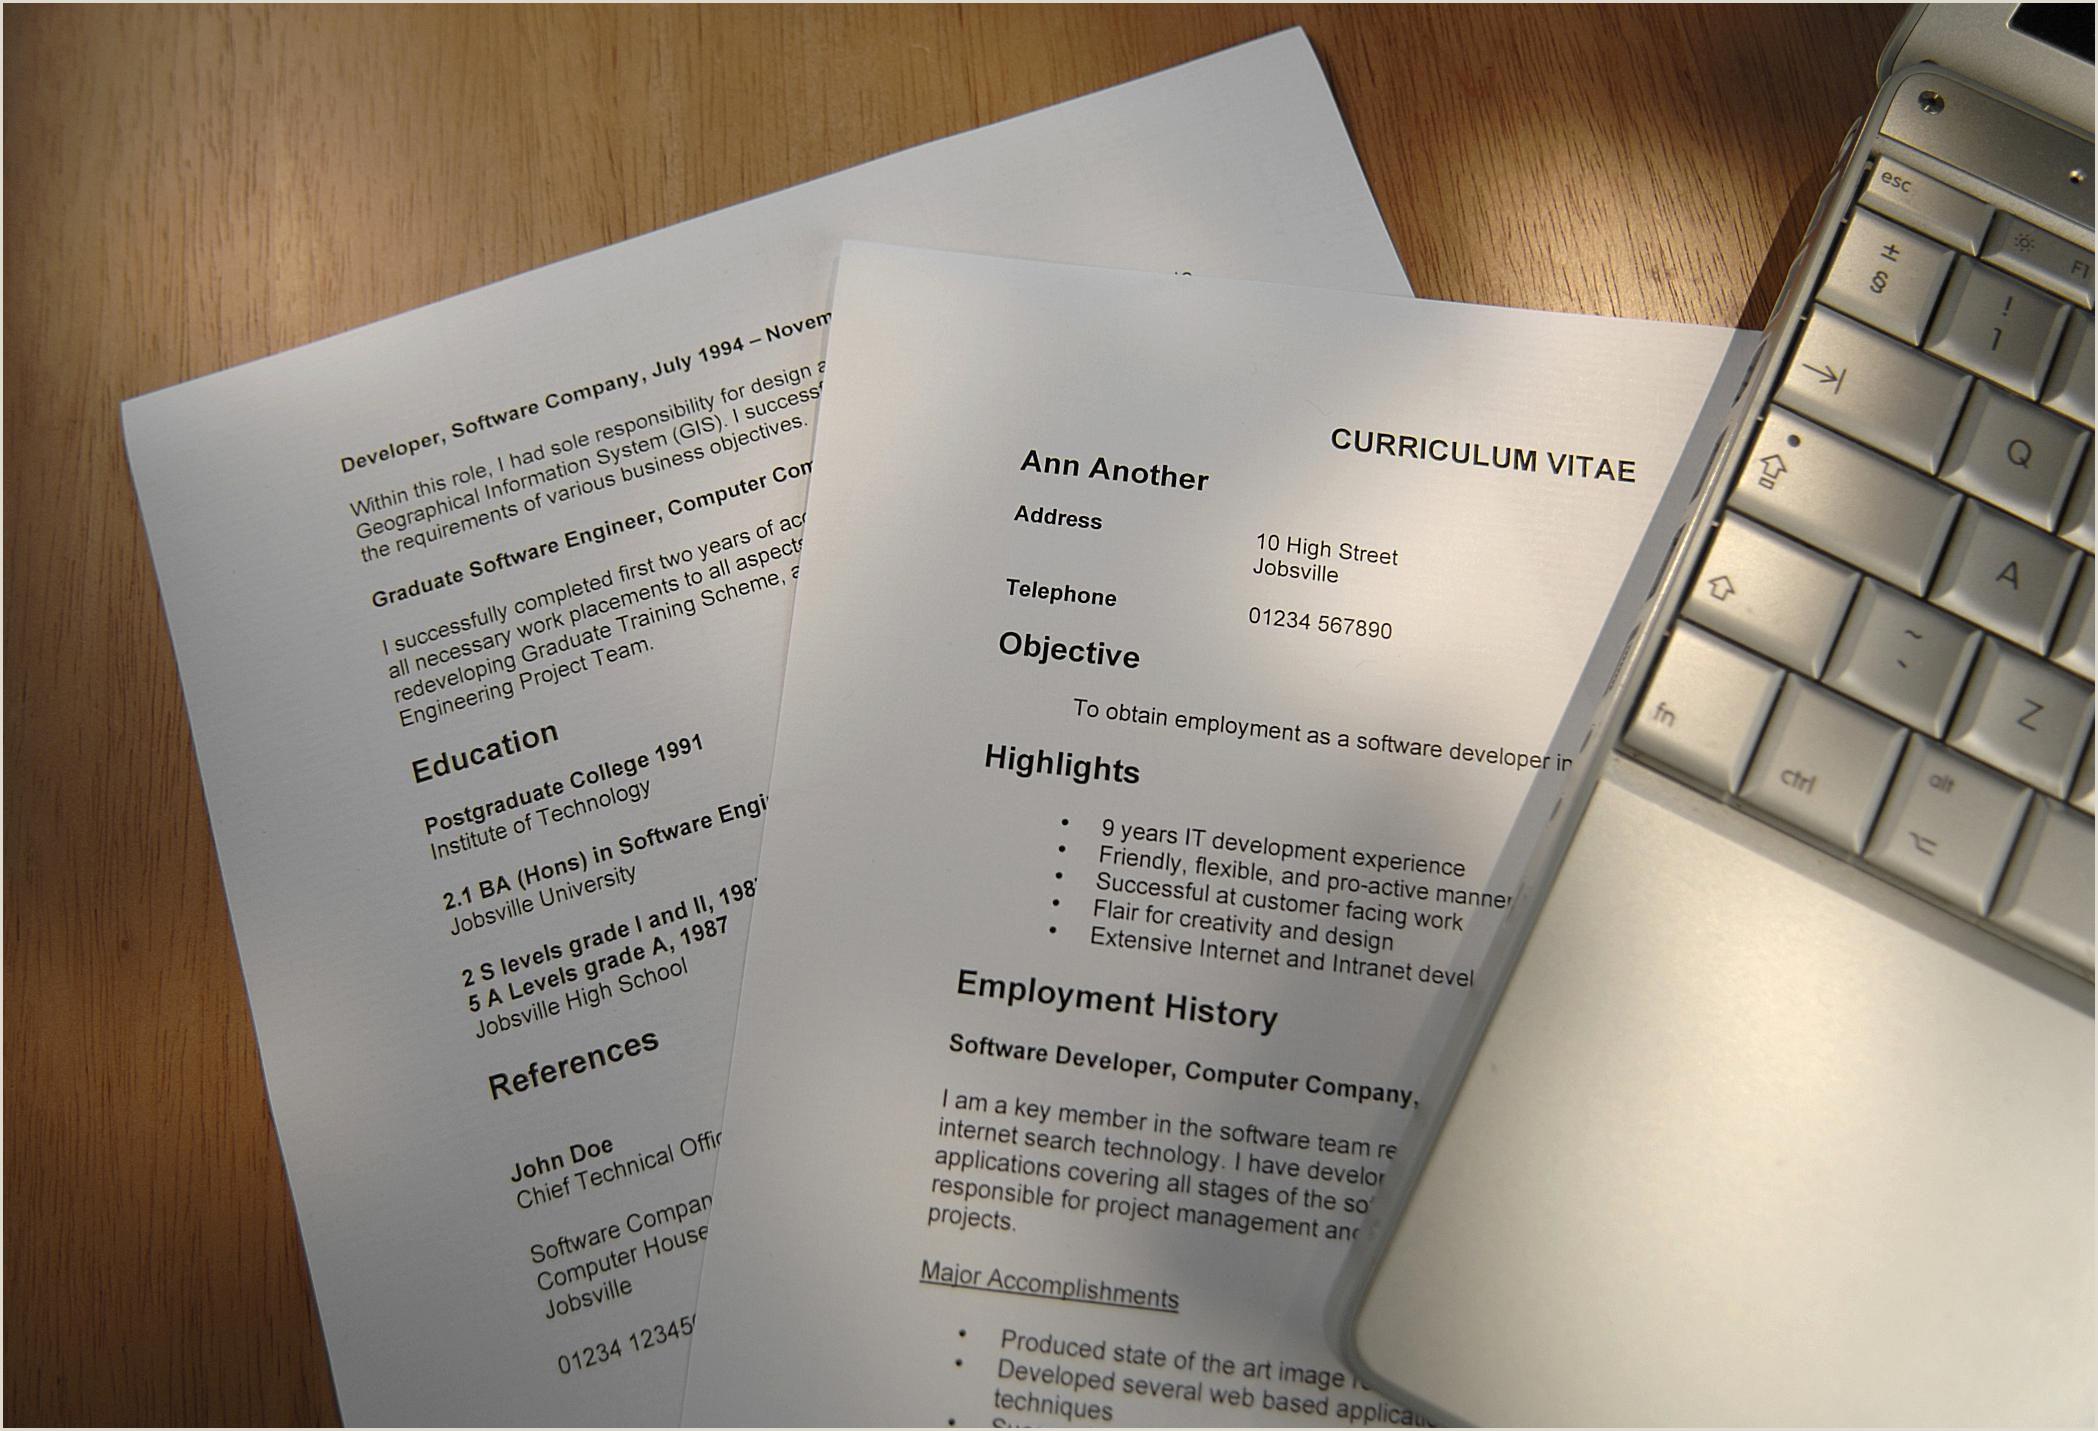 Latest Curriculum Vitae format Download Academic Curriculum Vitae Cv Example and Writing Tips